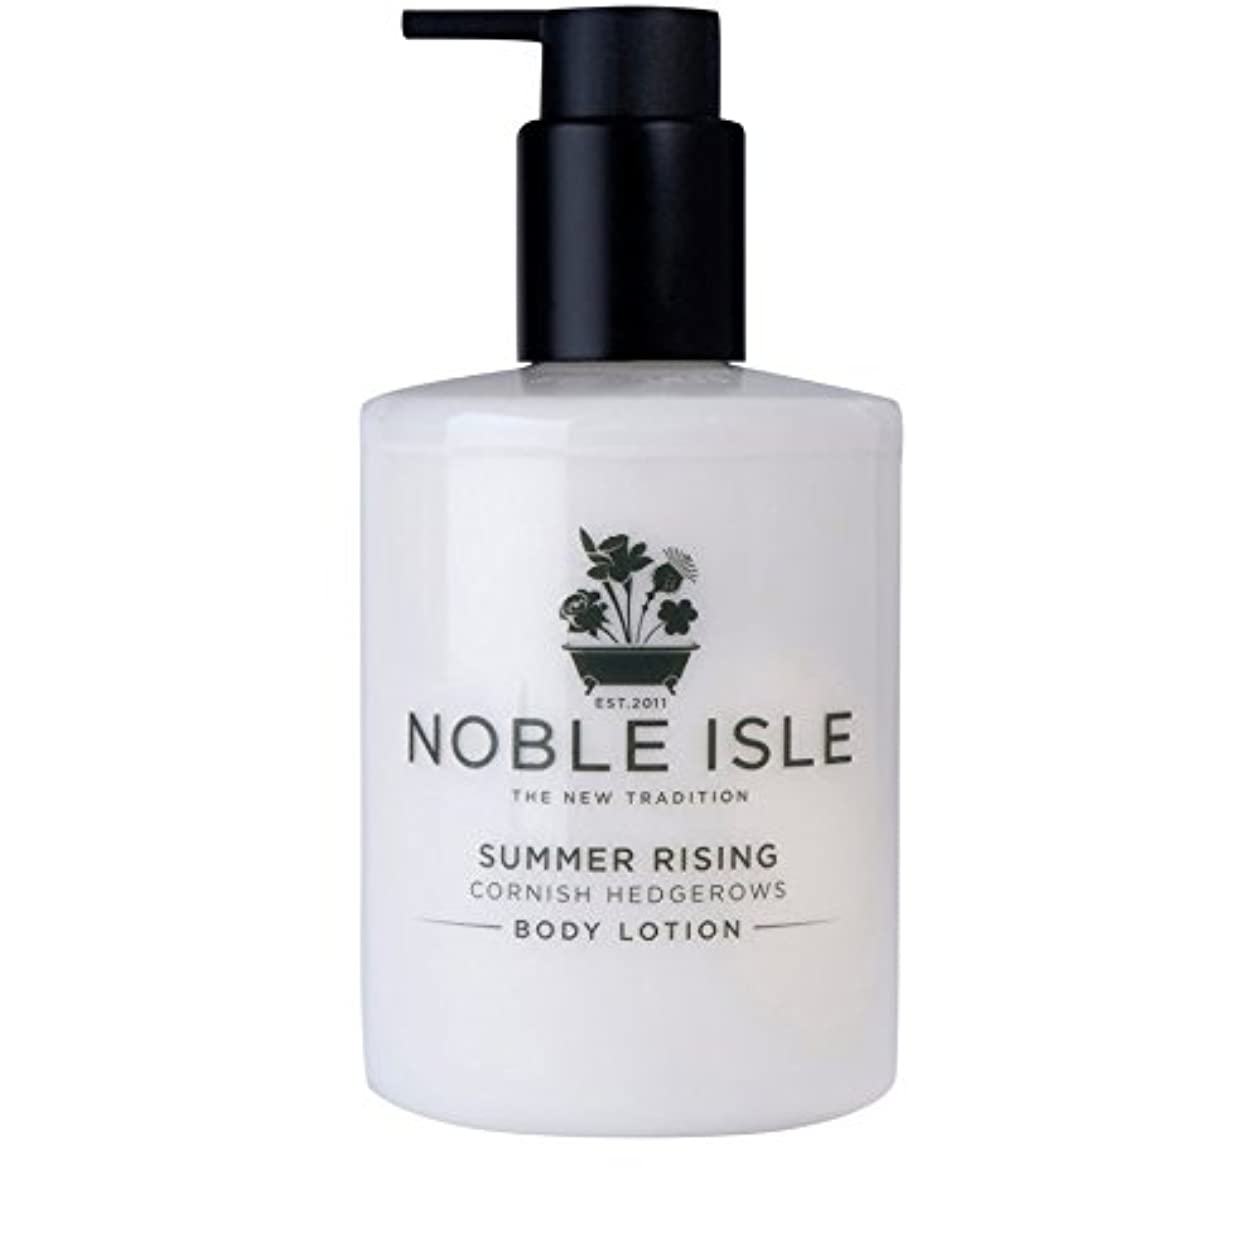 Noble Isle Summer Rising Cornish Hedgerows Body Lotion 250ml (Pack of 6) - コーニッシュ生け垣ボディローション250ミリリットルを上昇高貴な島の夏...